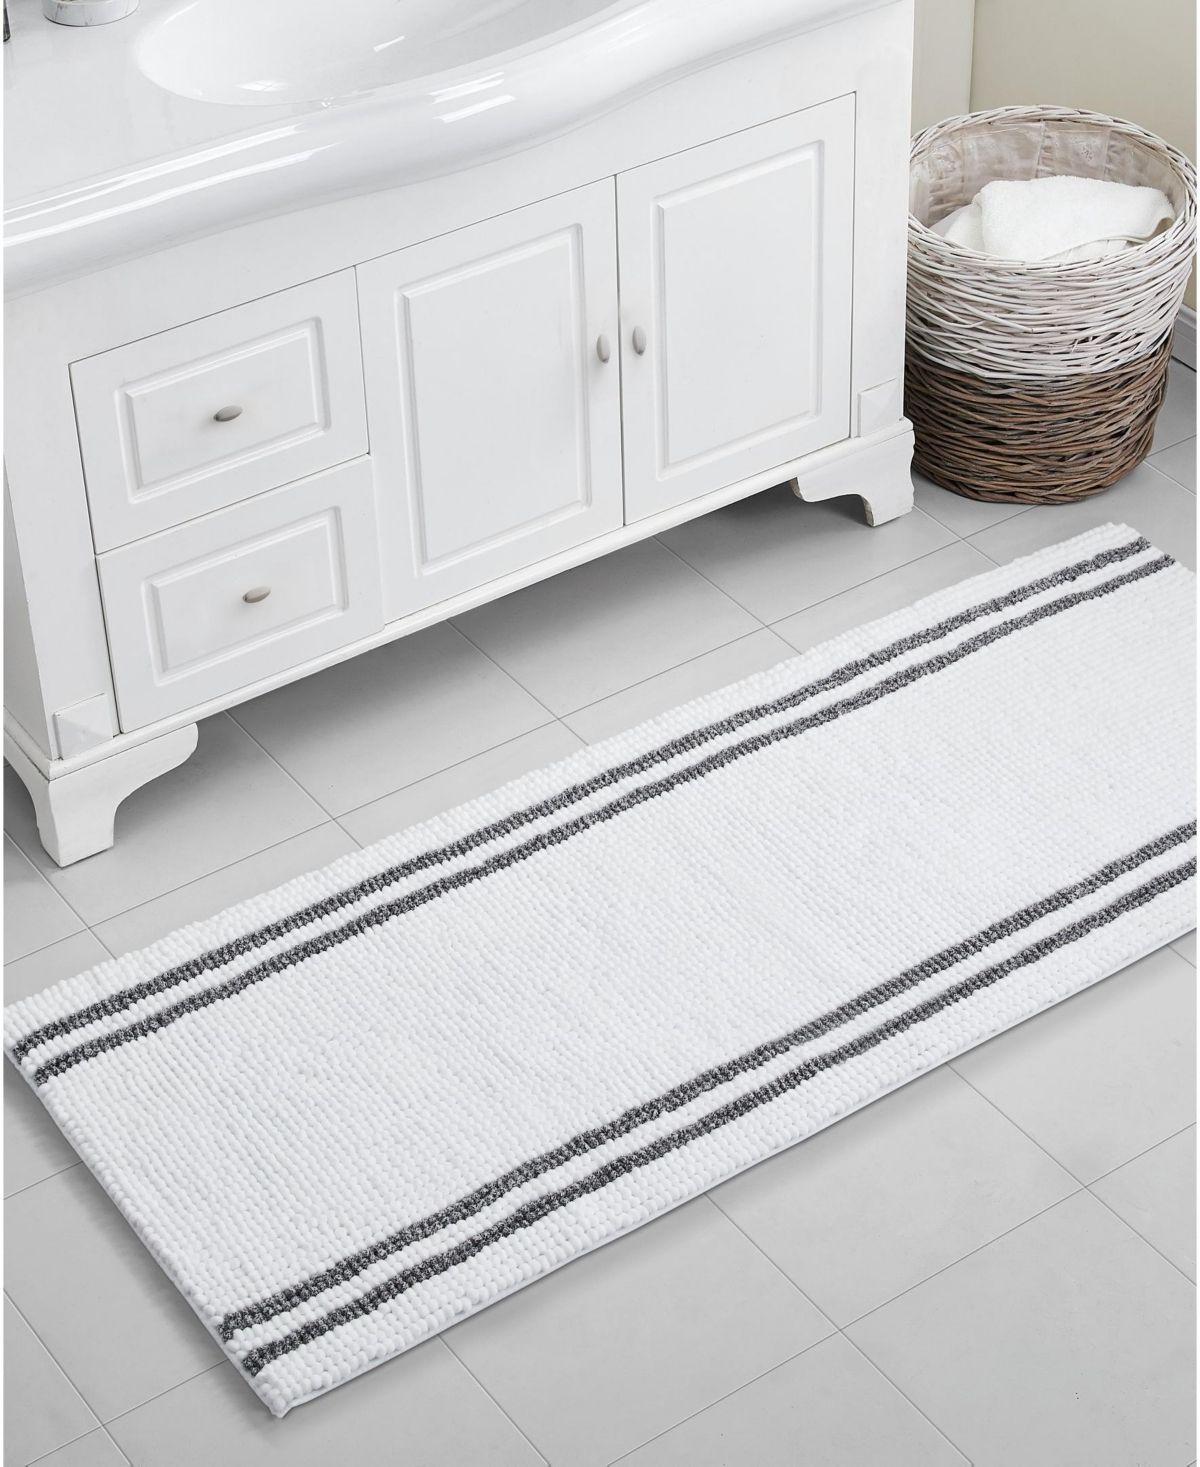 Vcny Home Stripe Noodle 24 X 60 Bath Rug White Bathroom Rug Bathroom Rugs Bath Rugs [ 1467 x 1200 Pixel ]